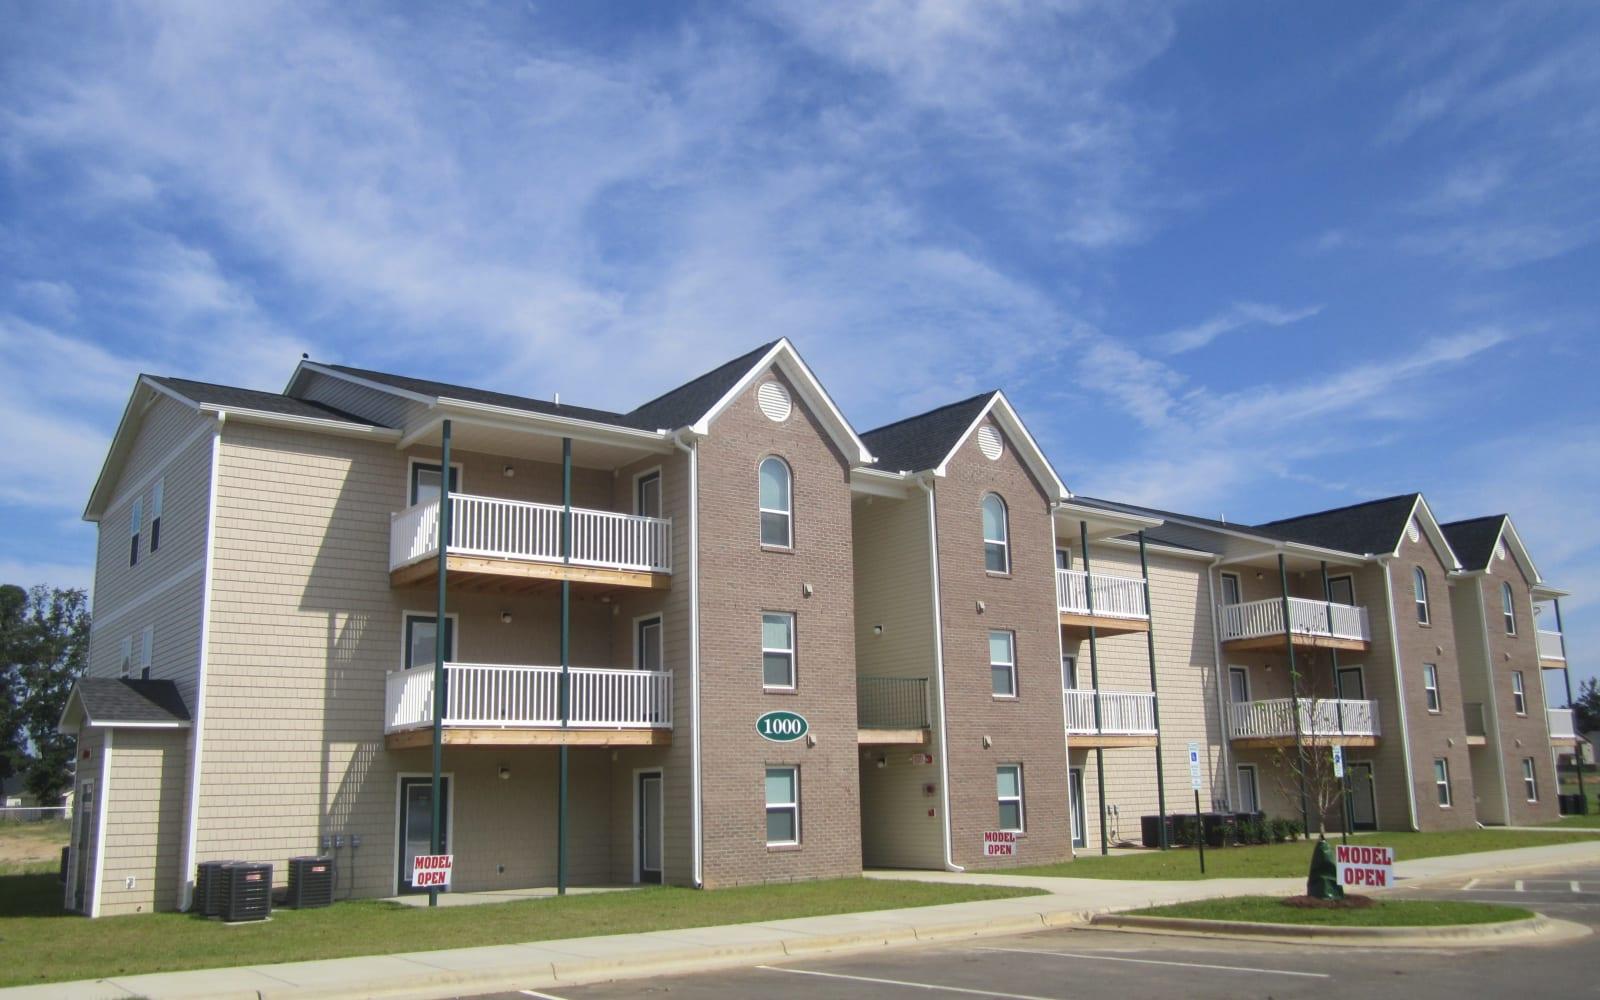 Beautiful new apartment buildings at Wedgefield Apartments in Raeford, North Carolina